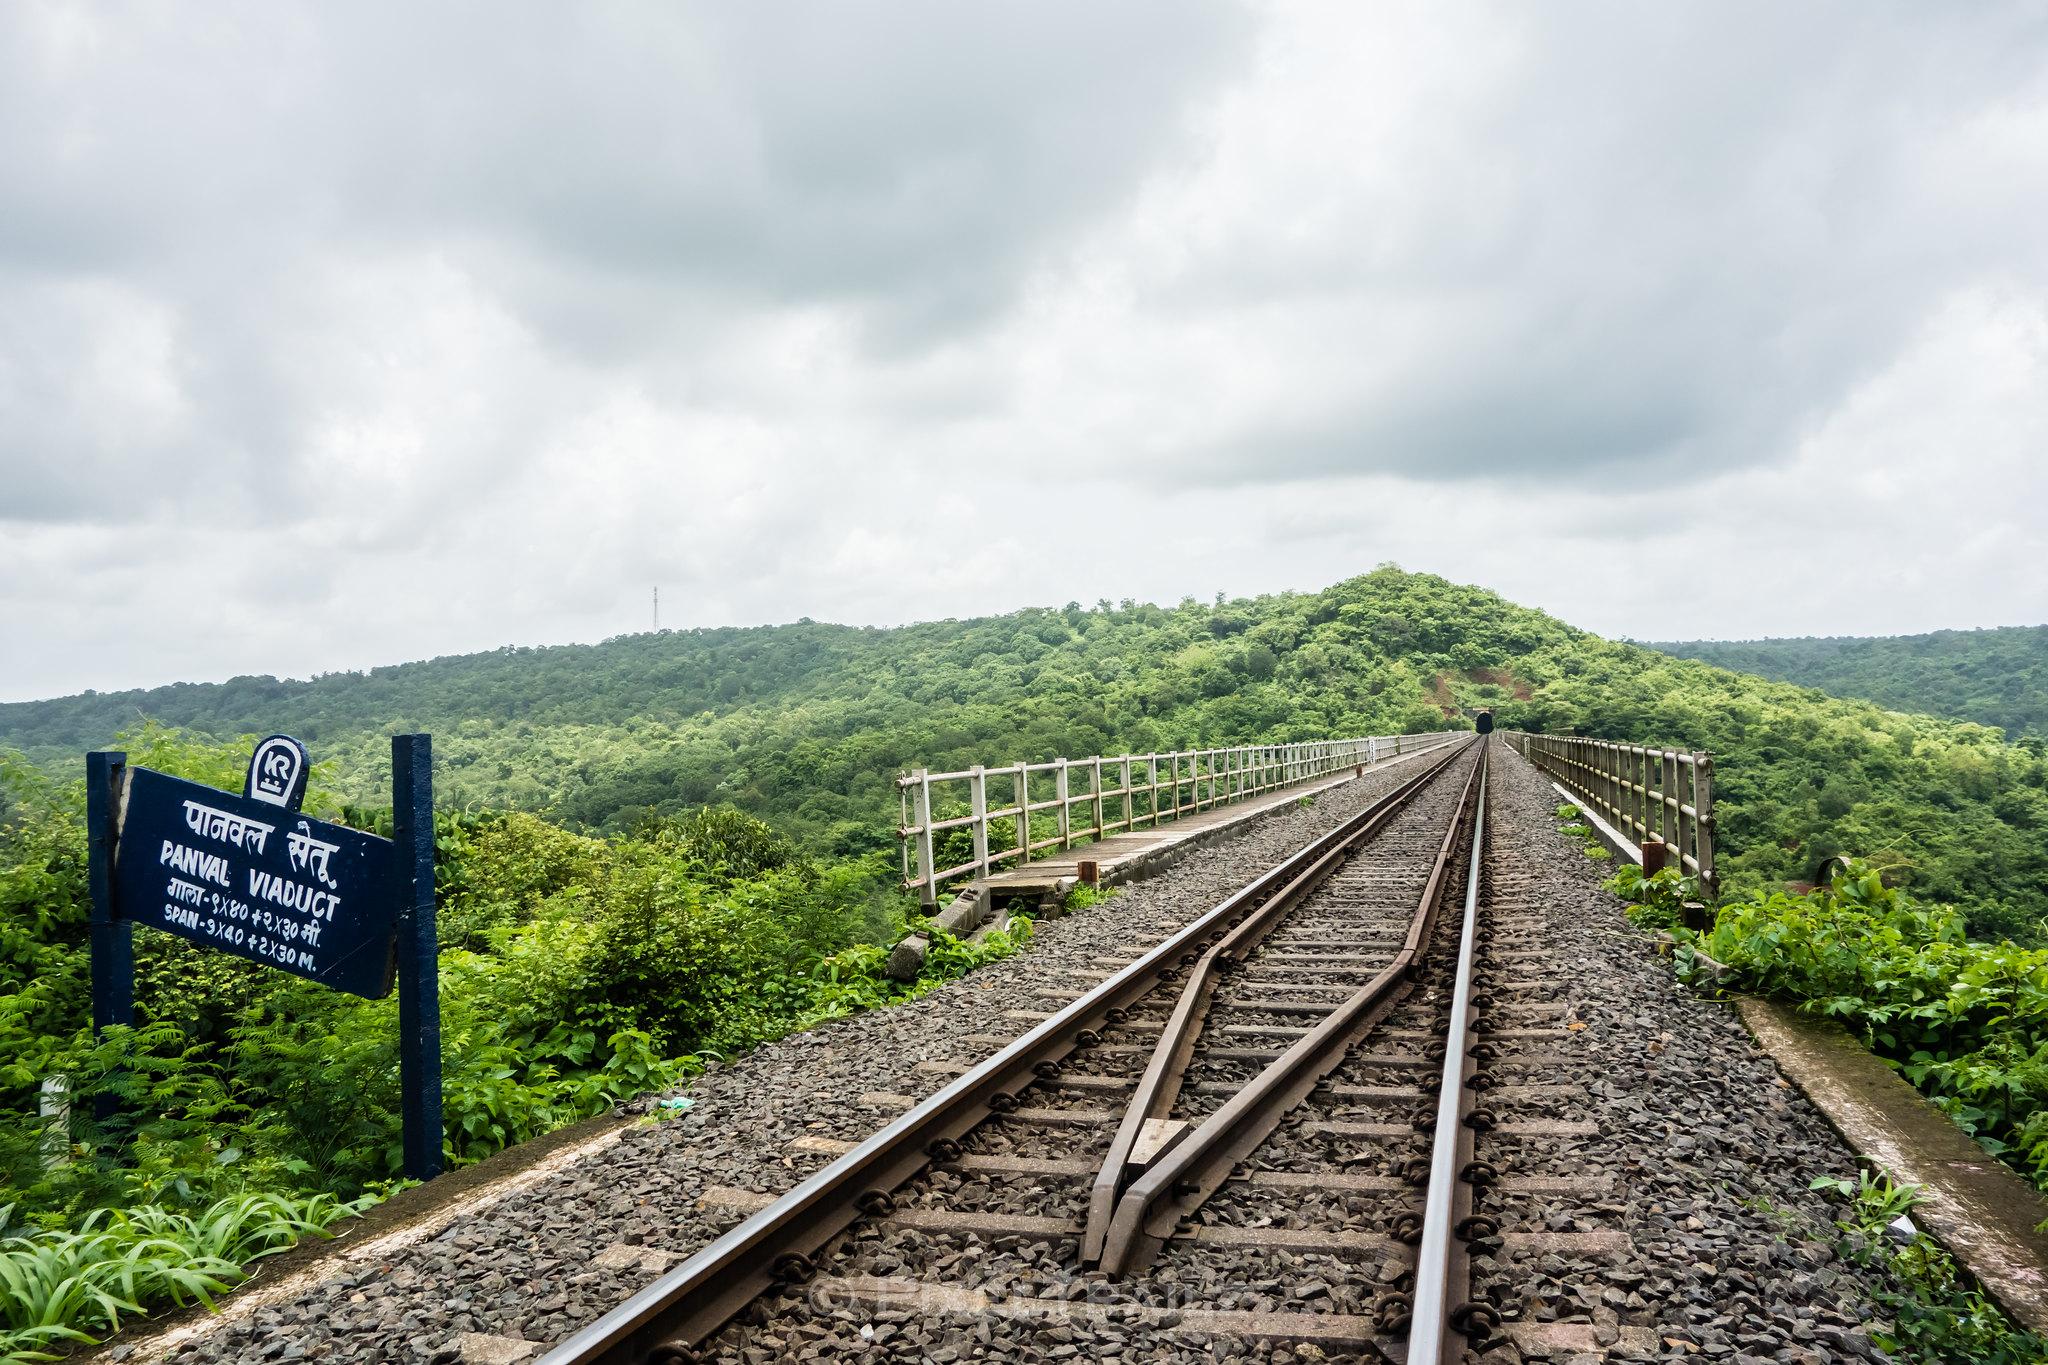 Panval Viaduct - II